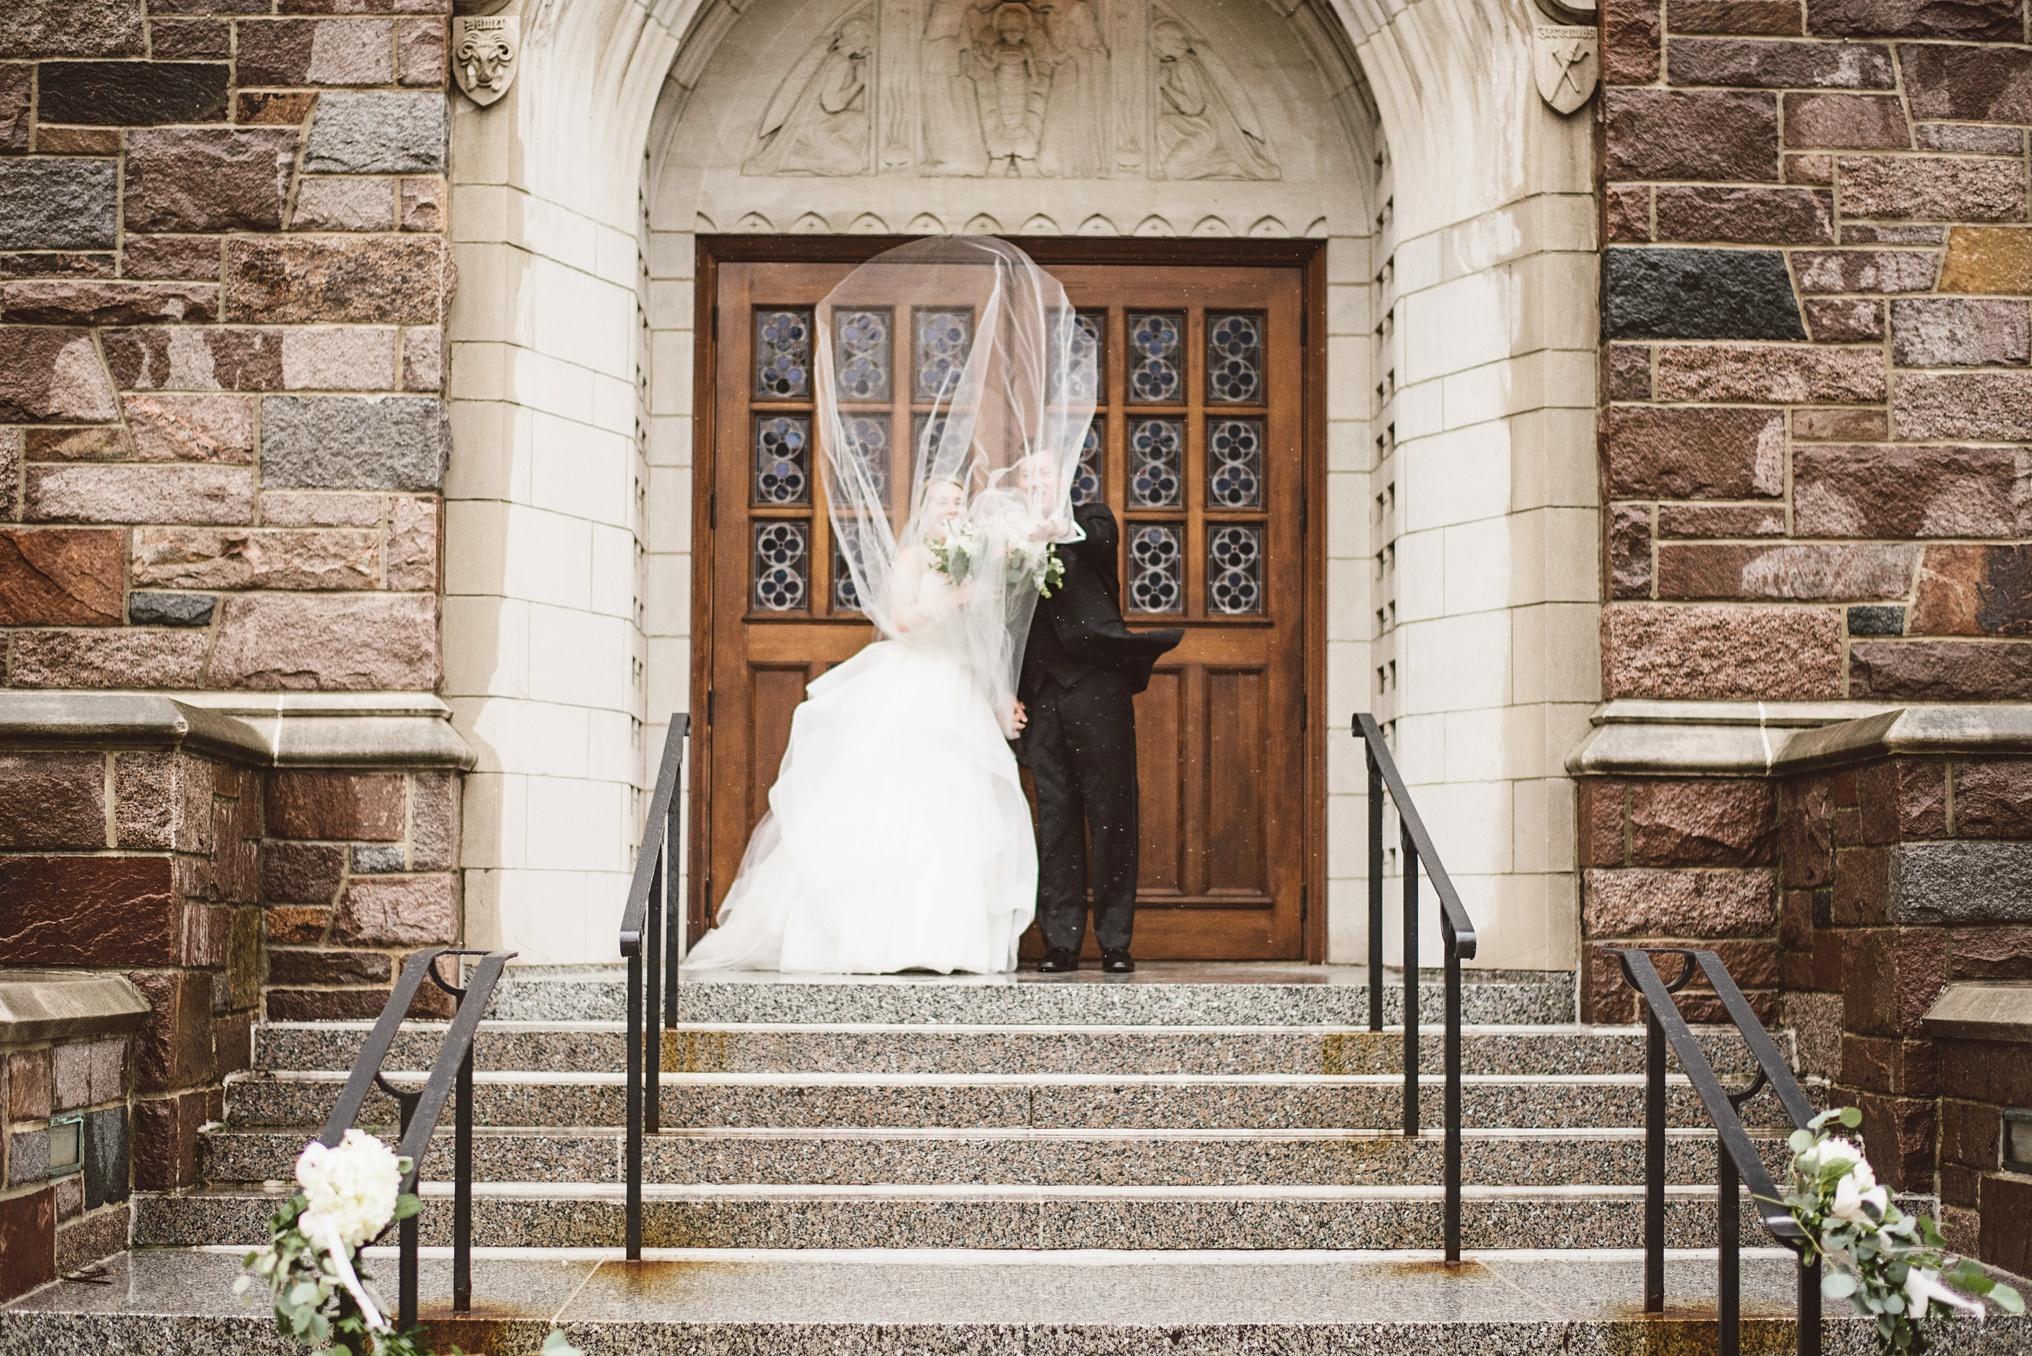 best_wedding_photography_2017_by_lucas_botz_photography_023.jpg